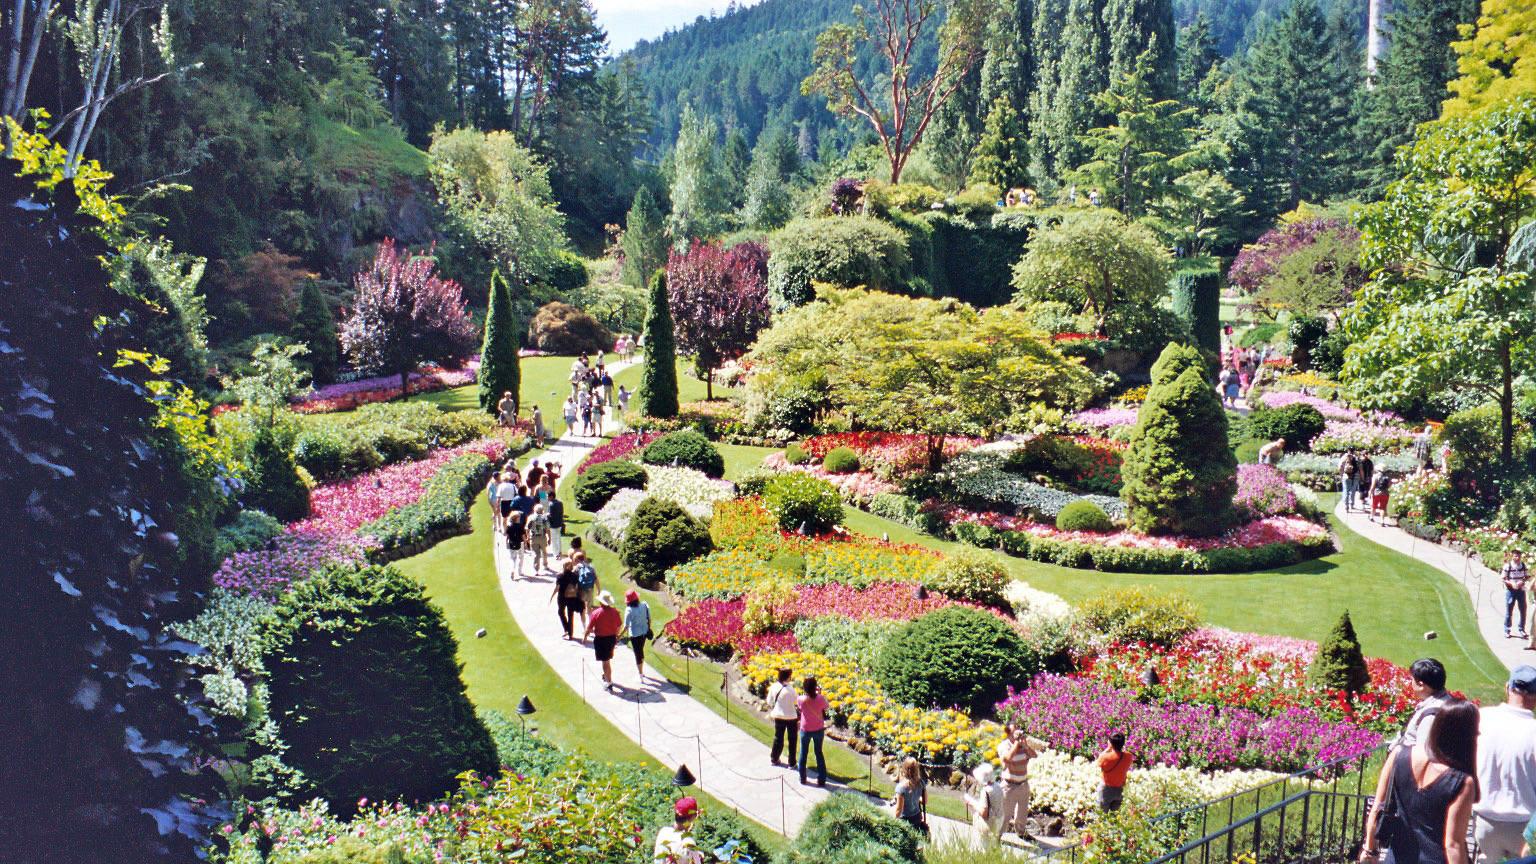 lockwood lavender farm butchart gardens in vancouver island canada